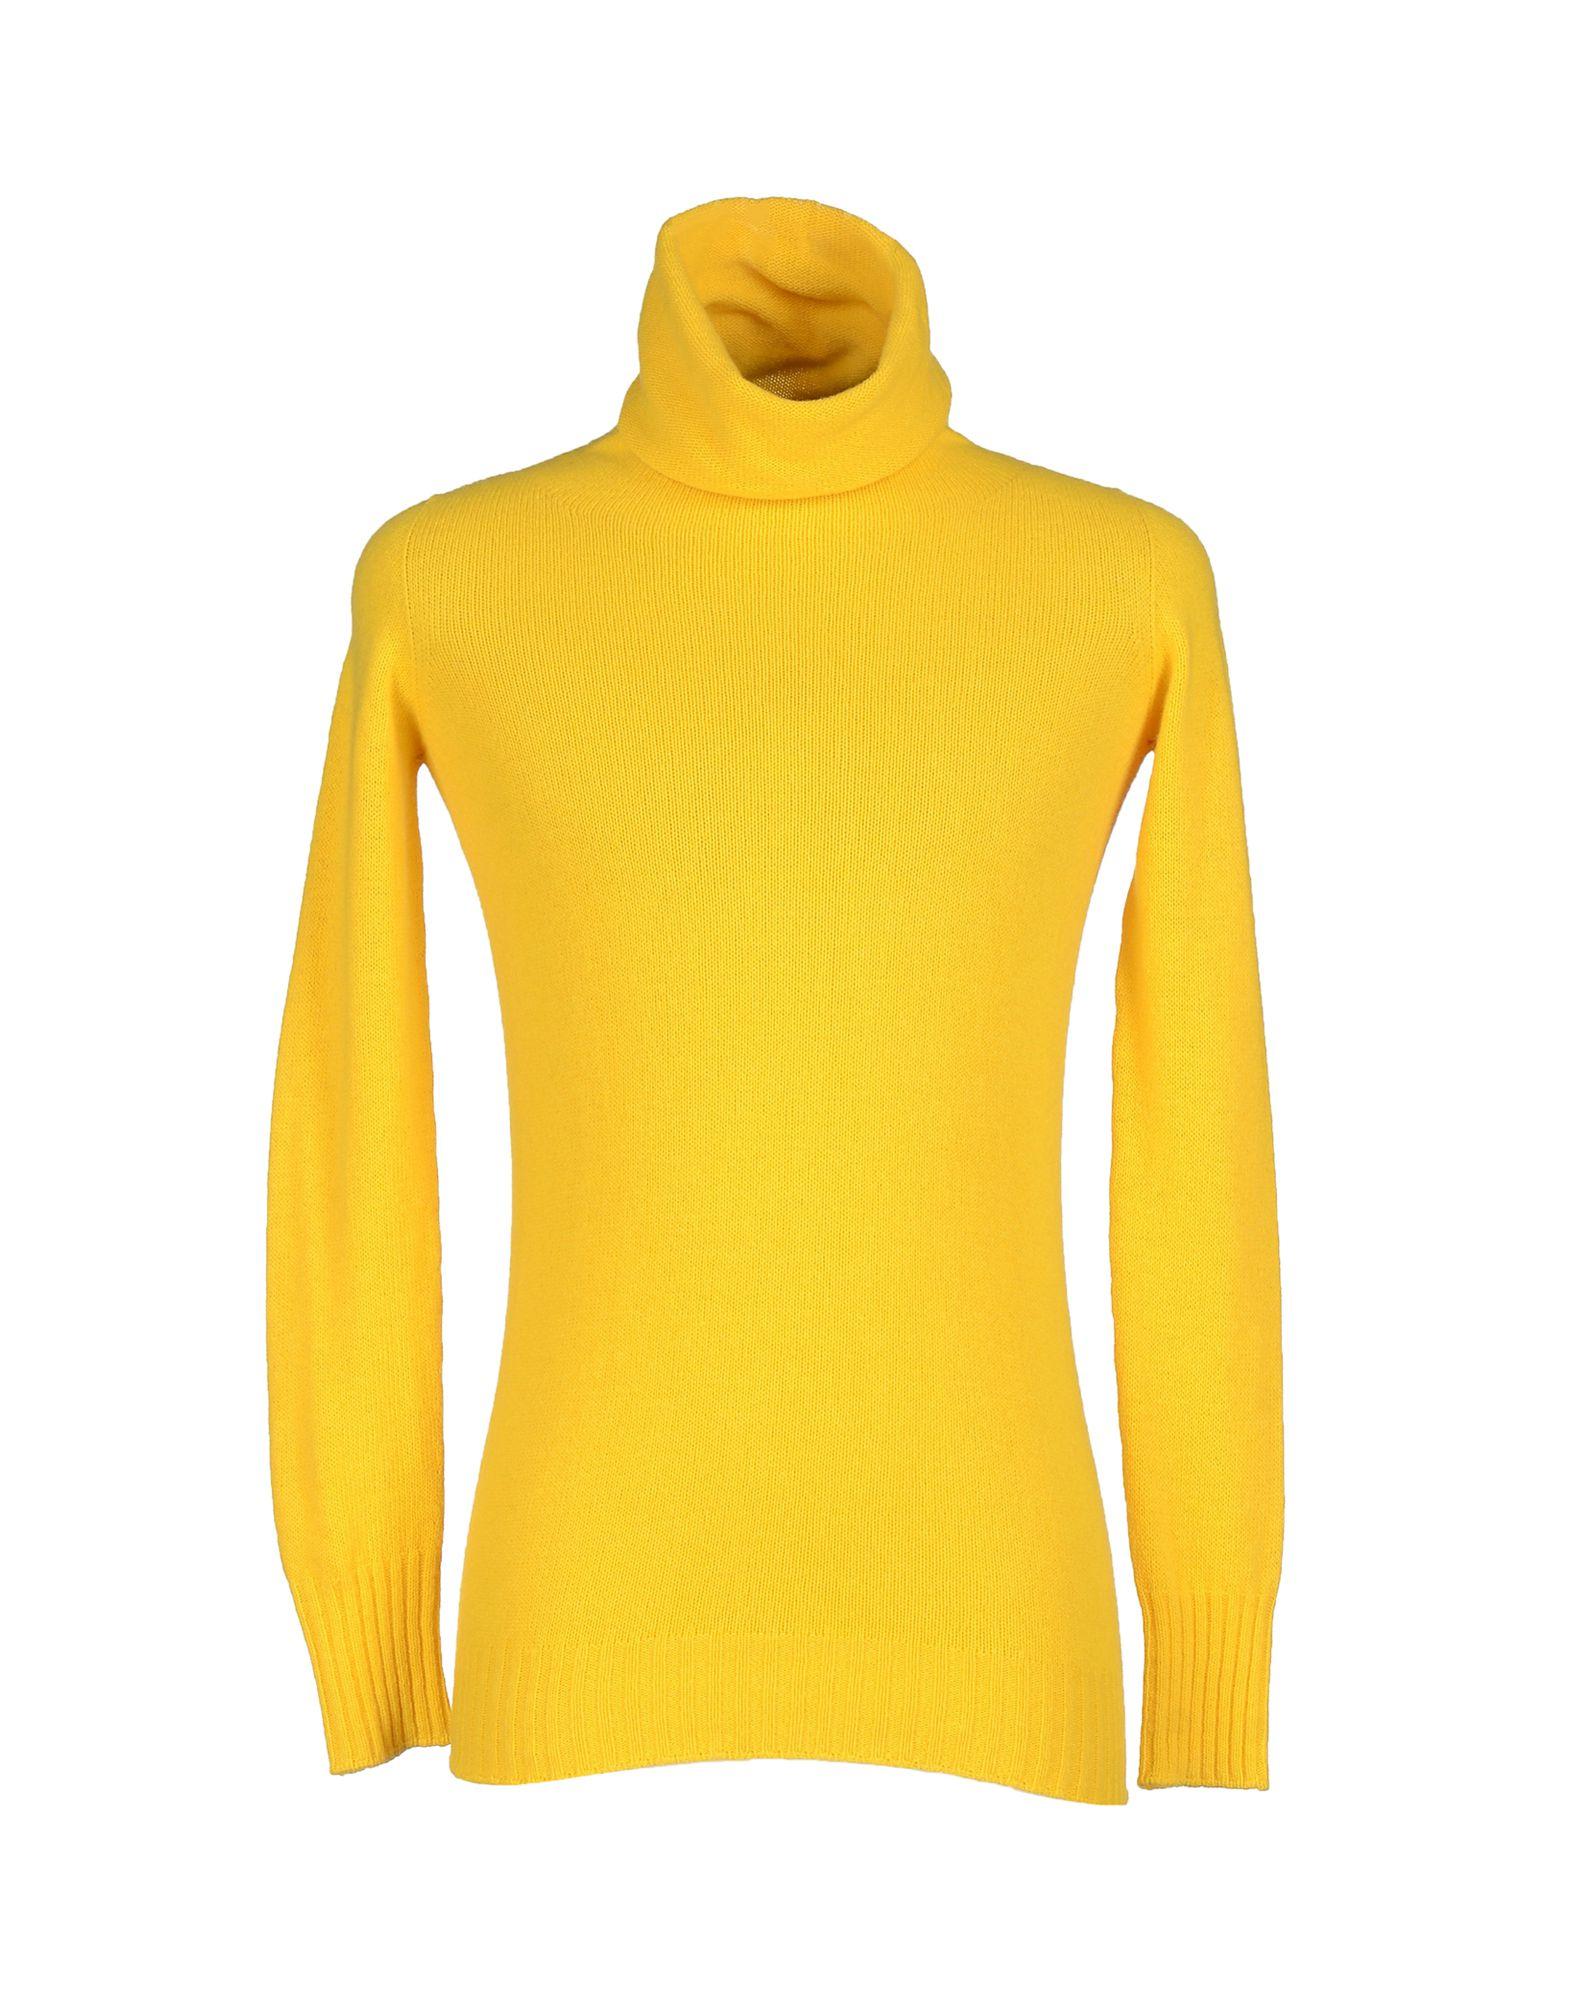 Roberto collina Turtleneck in Yellow for Men